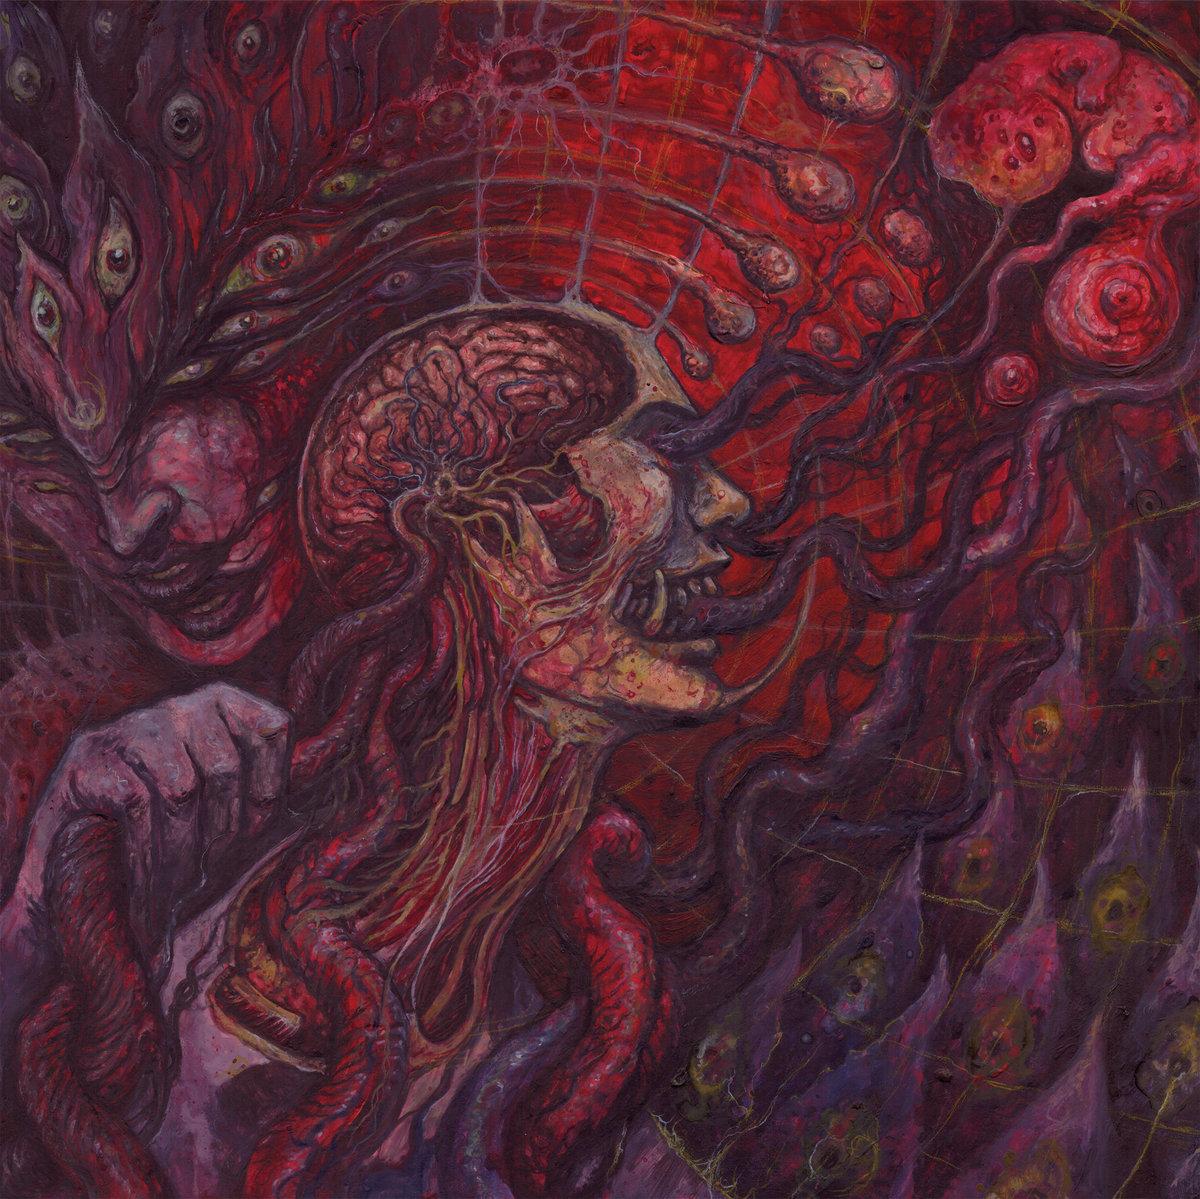 Poison Palinopsia   Qrixkuor   Invictus Productions